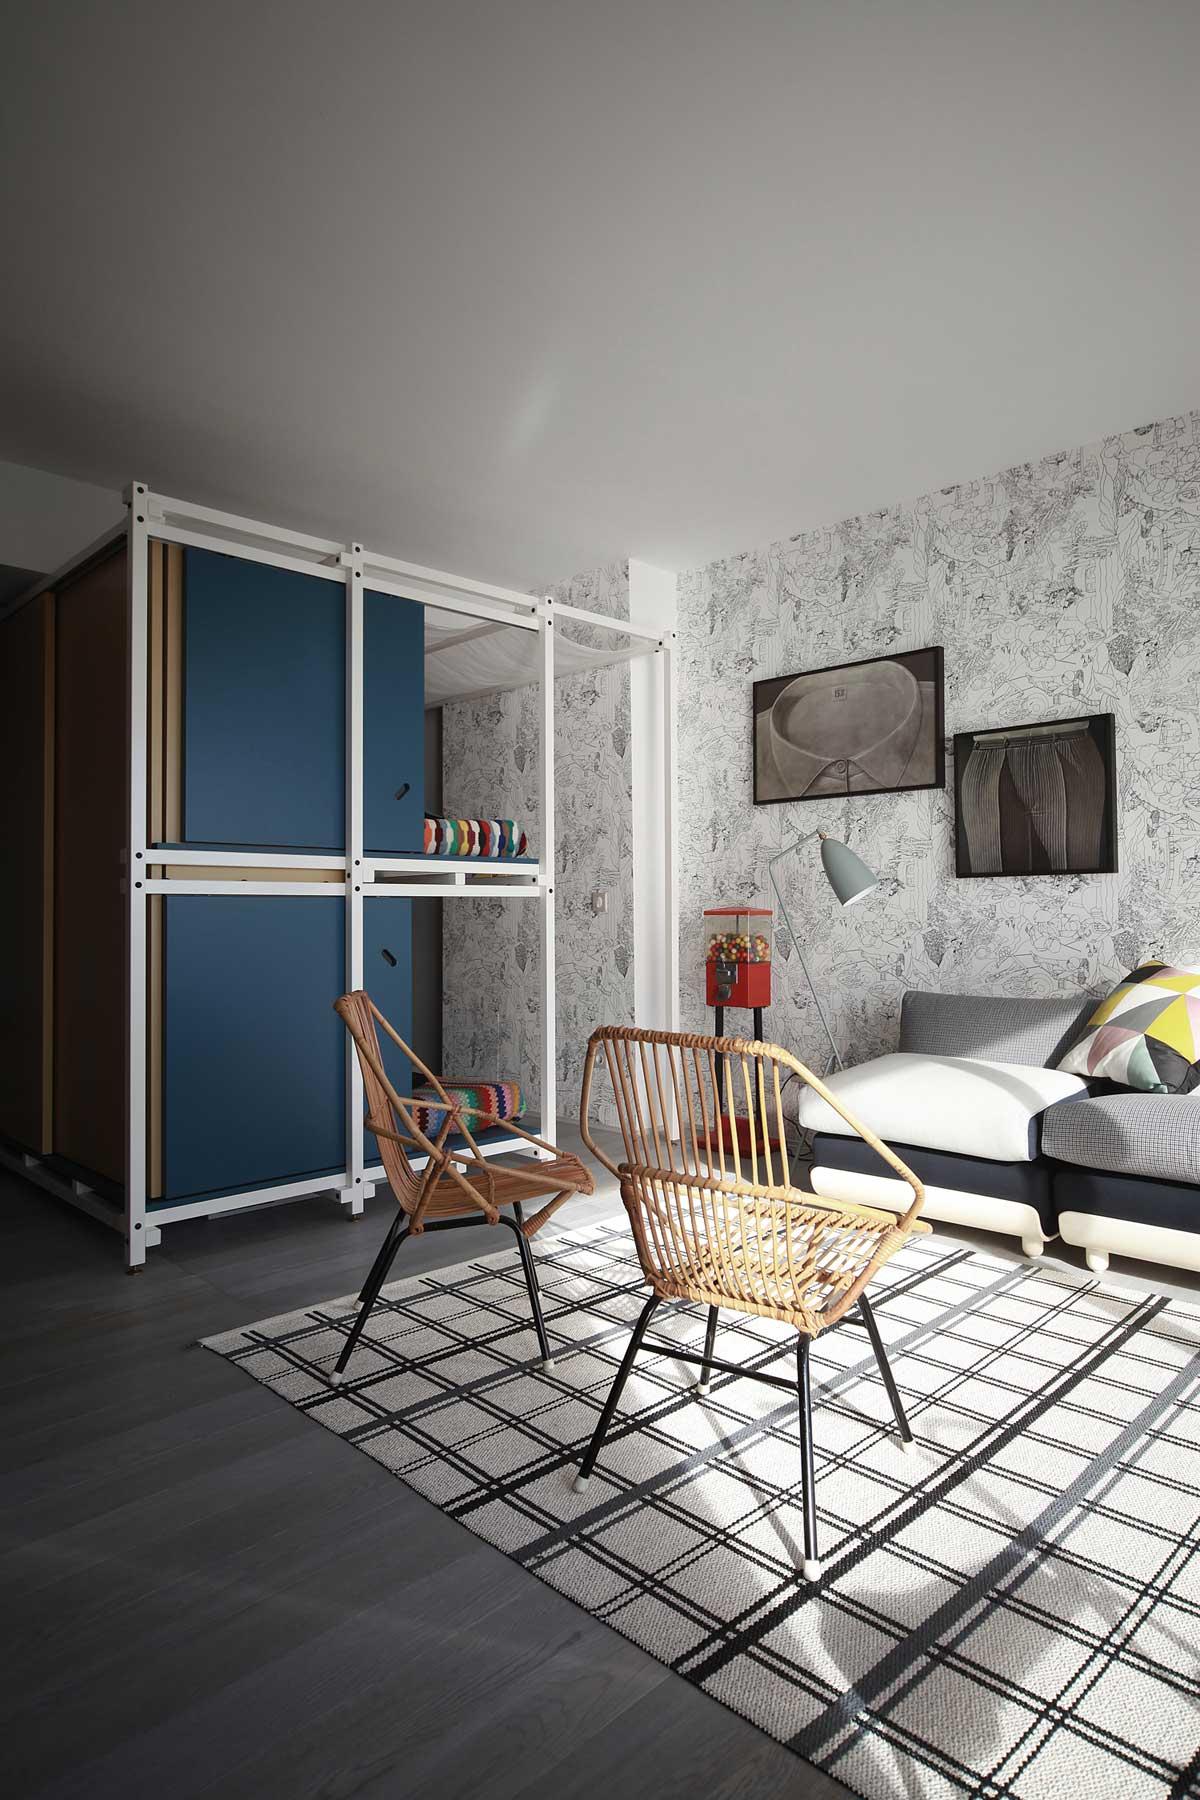 Интерьер маленькой квартиры в морском стиле